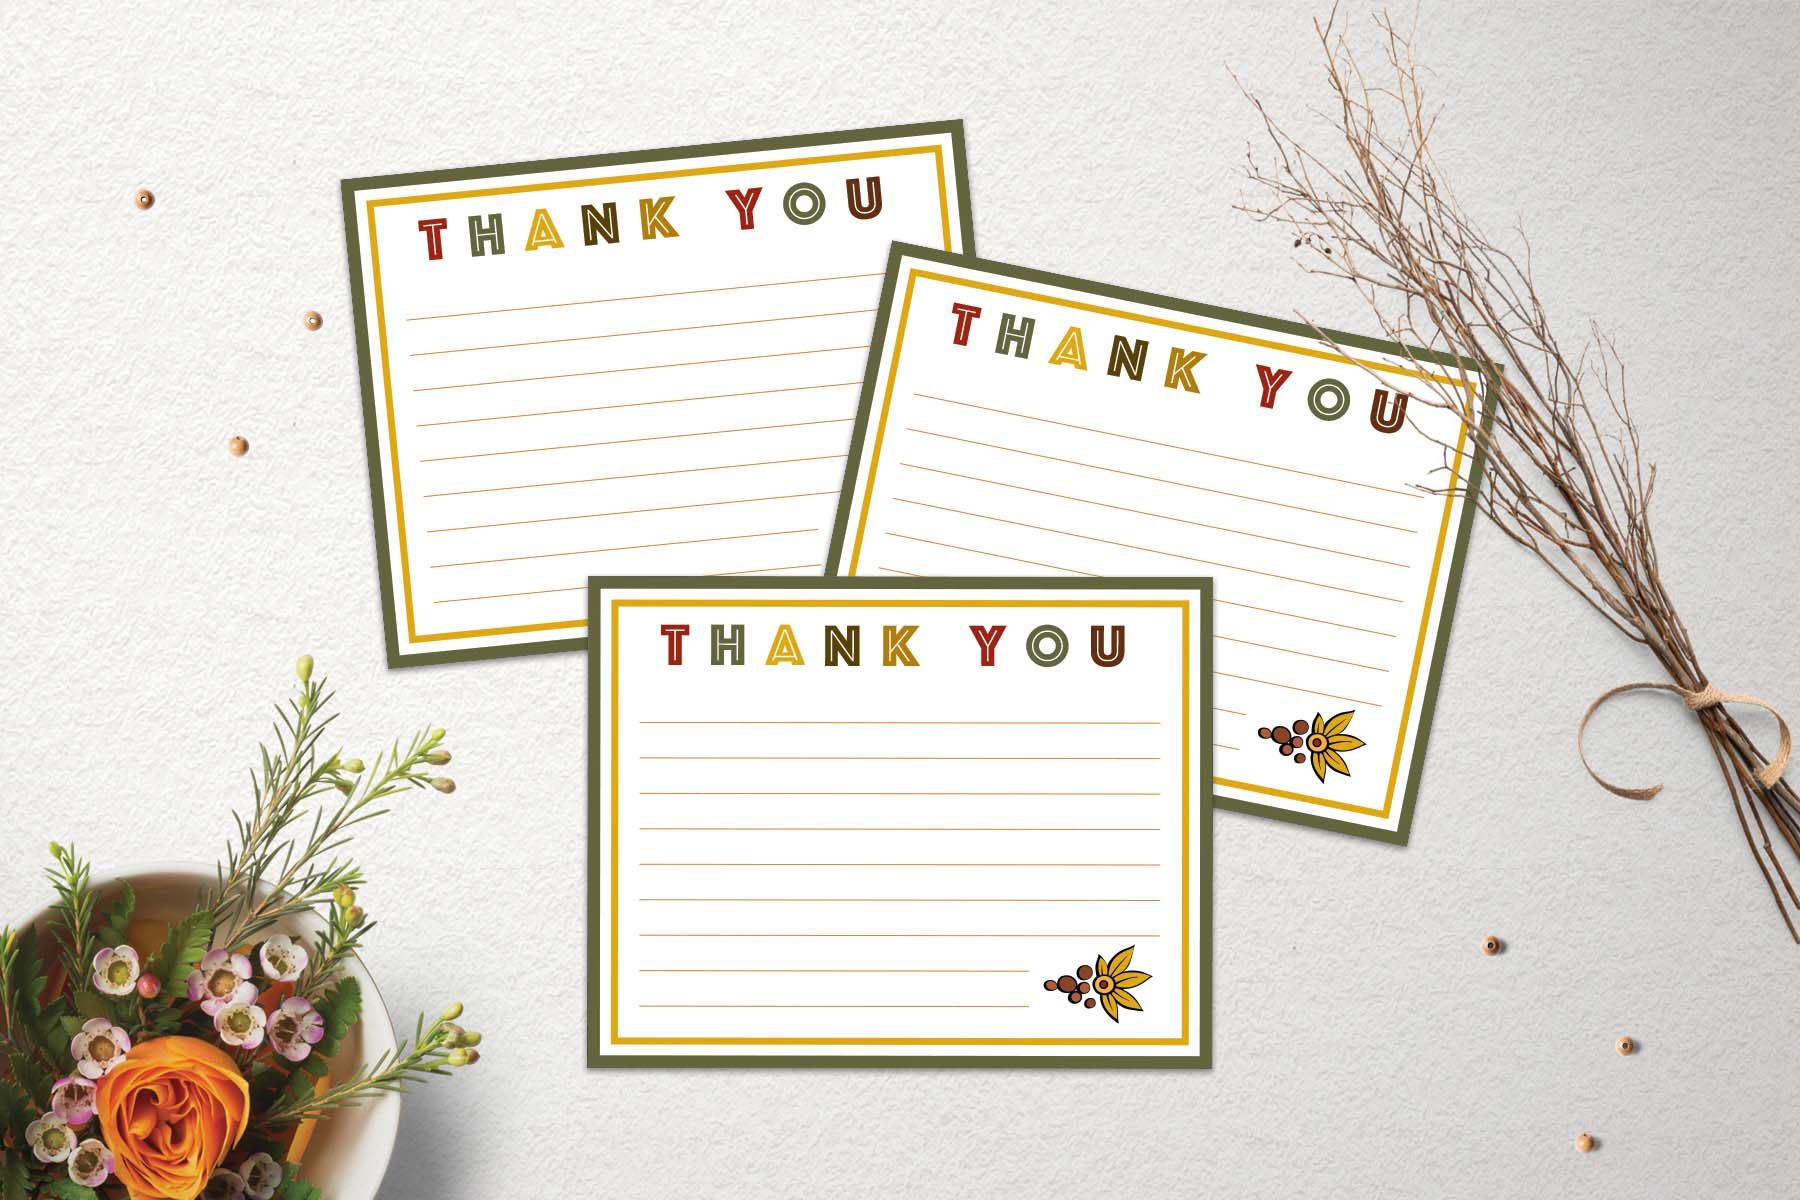 Free Thanksgiving Thank You Cards Www Teepeegirl Com